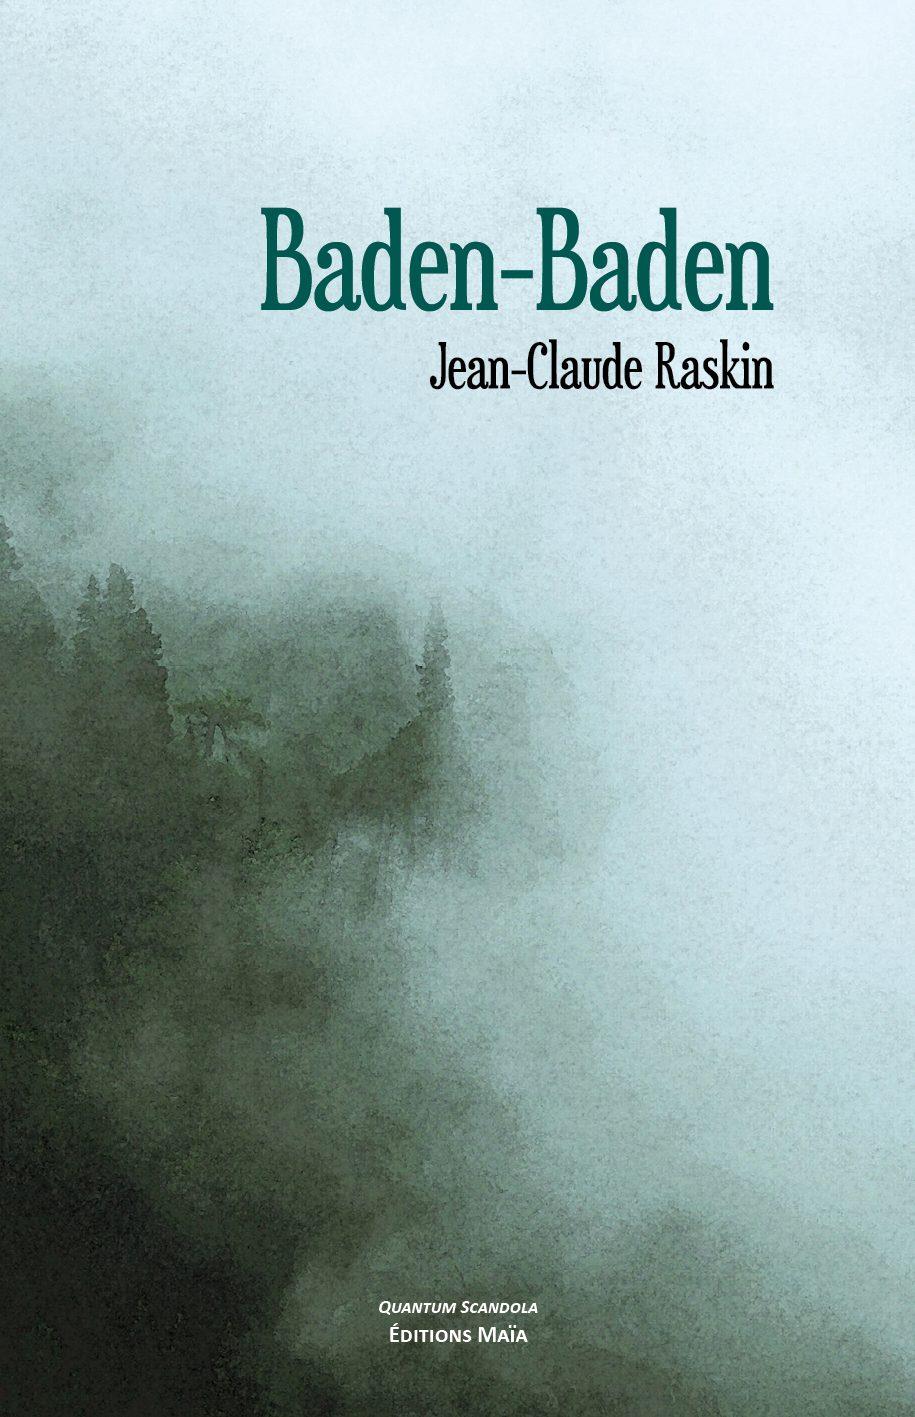 Entretien avec Jean-Claude Raskin – Baden-Baden